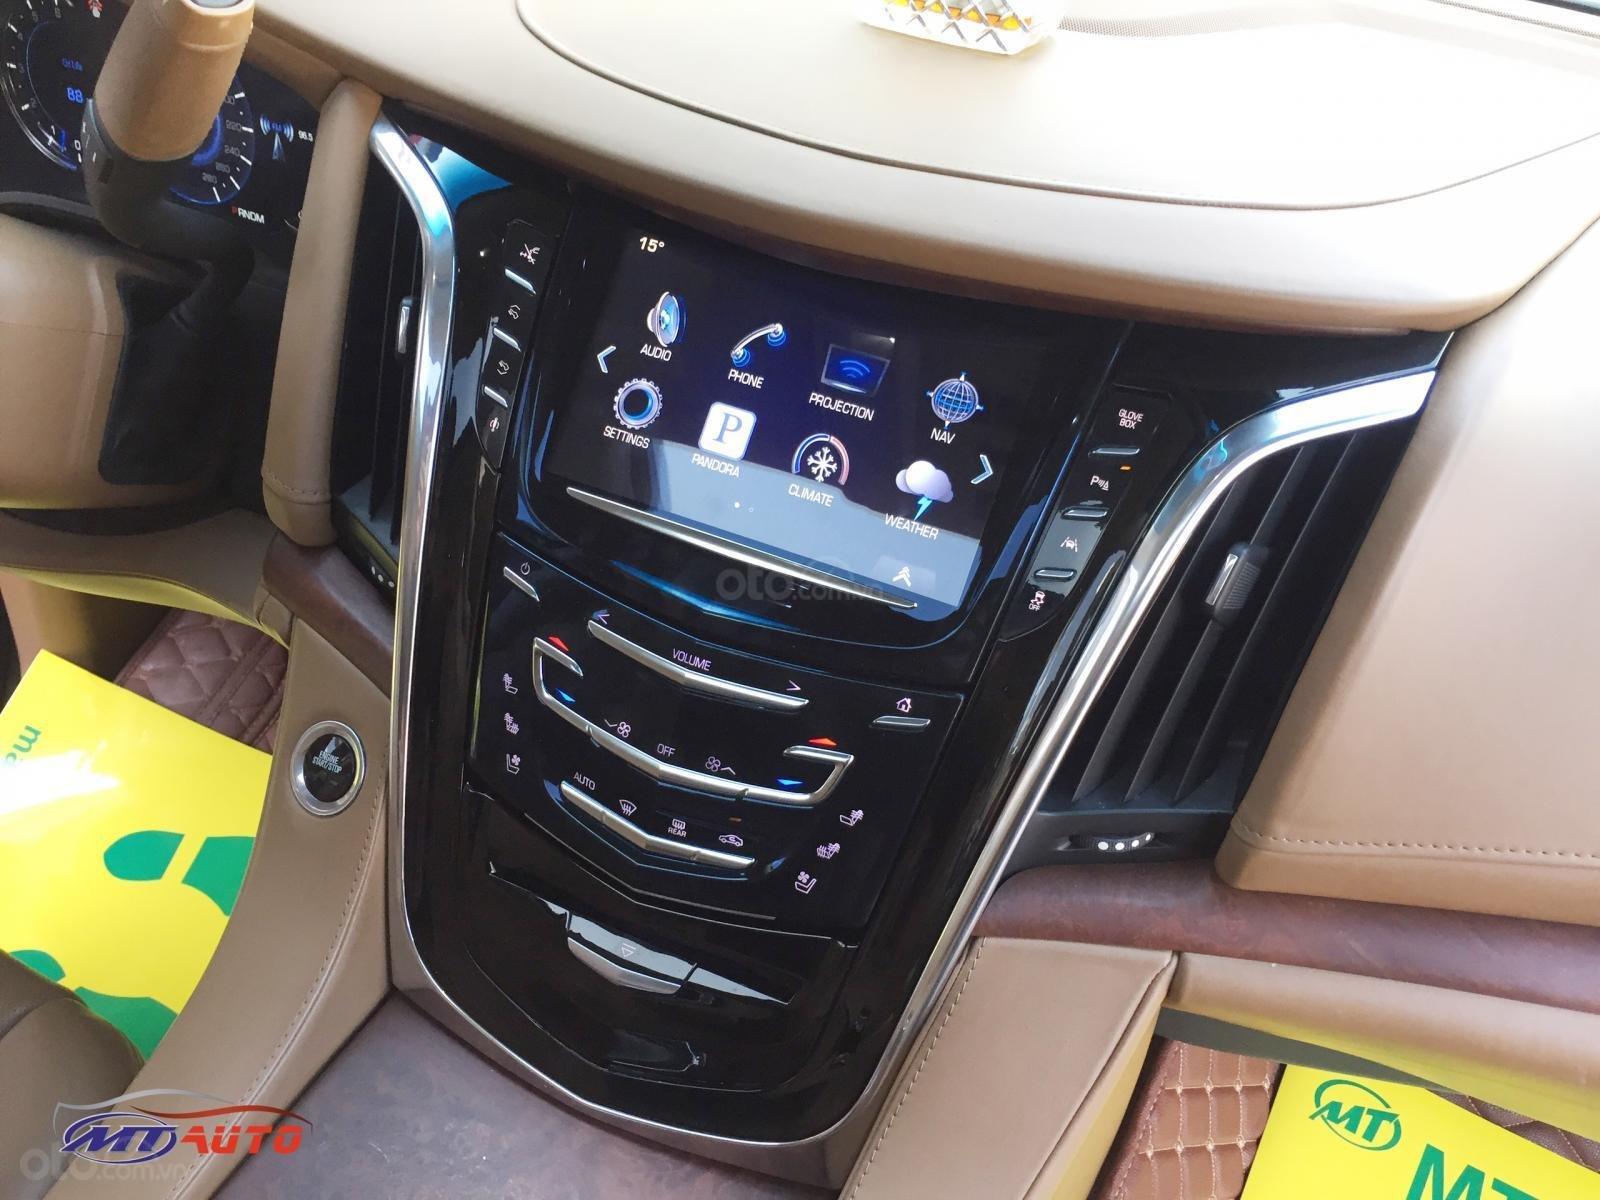 Bán Cadillac Escalade ESV Platinum model 2016, LH em Huân 0981.0101.61 (9)